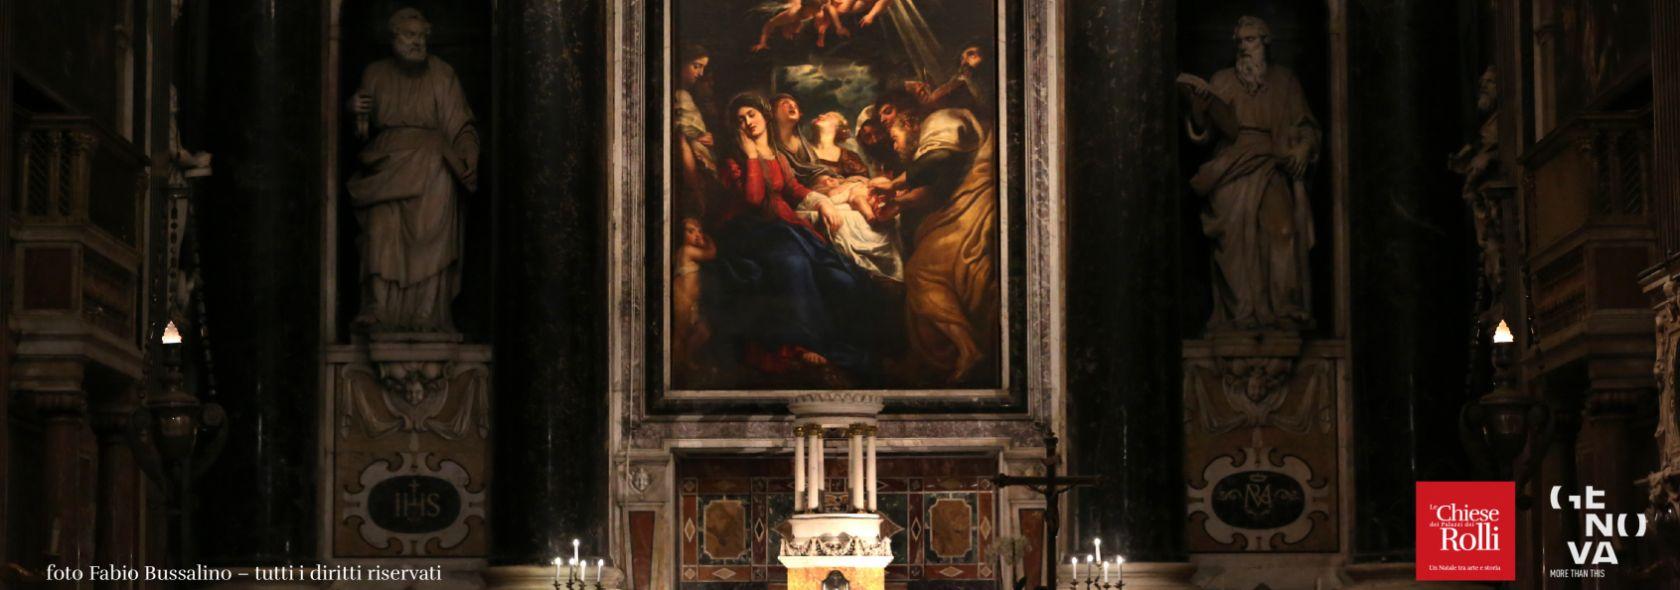 Chiesa del Gesu - P.P.Rubens, Circoncisione di Gesu - Foto Fabio Bussalino